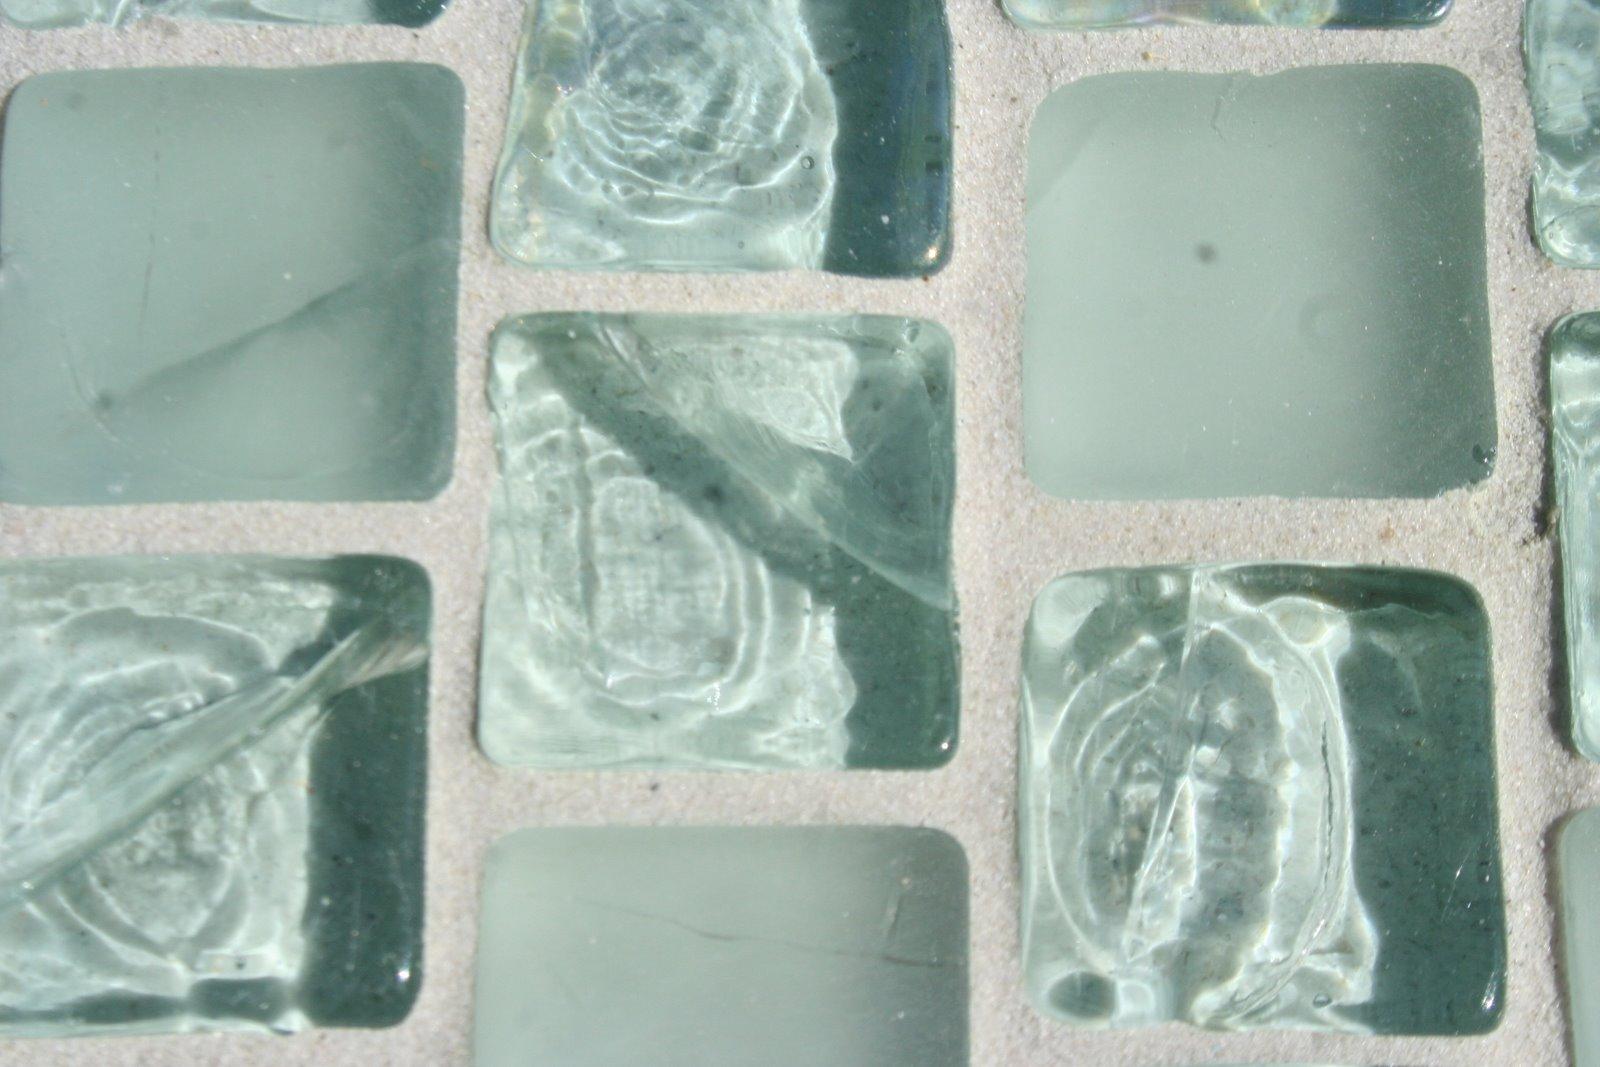 Failure of Glass Mosaic Tile - Cracks Fractures Fissures \u0026 Spalling & Failure of Glass Mosaic Tile | Aquatic Technology Pool \u0026 Spa ...